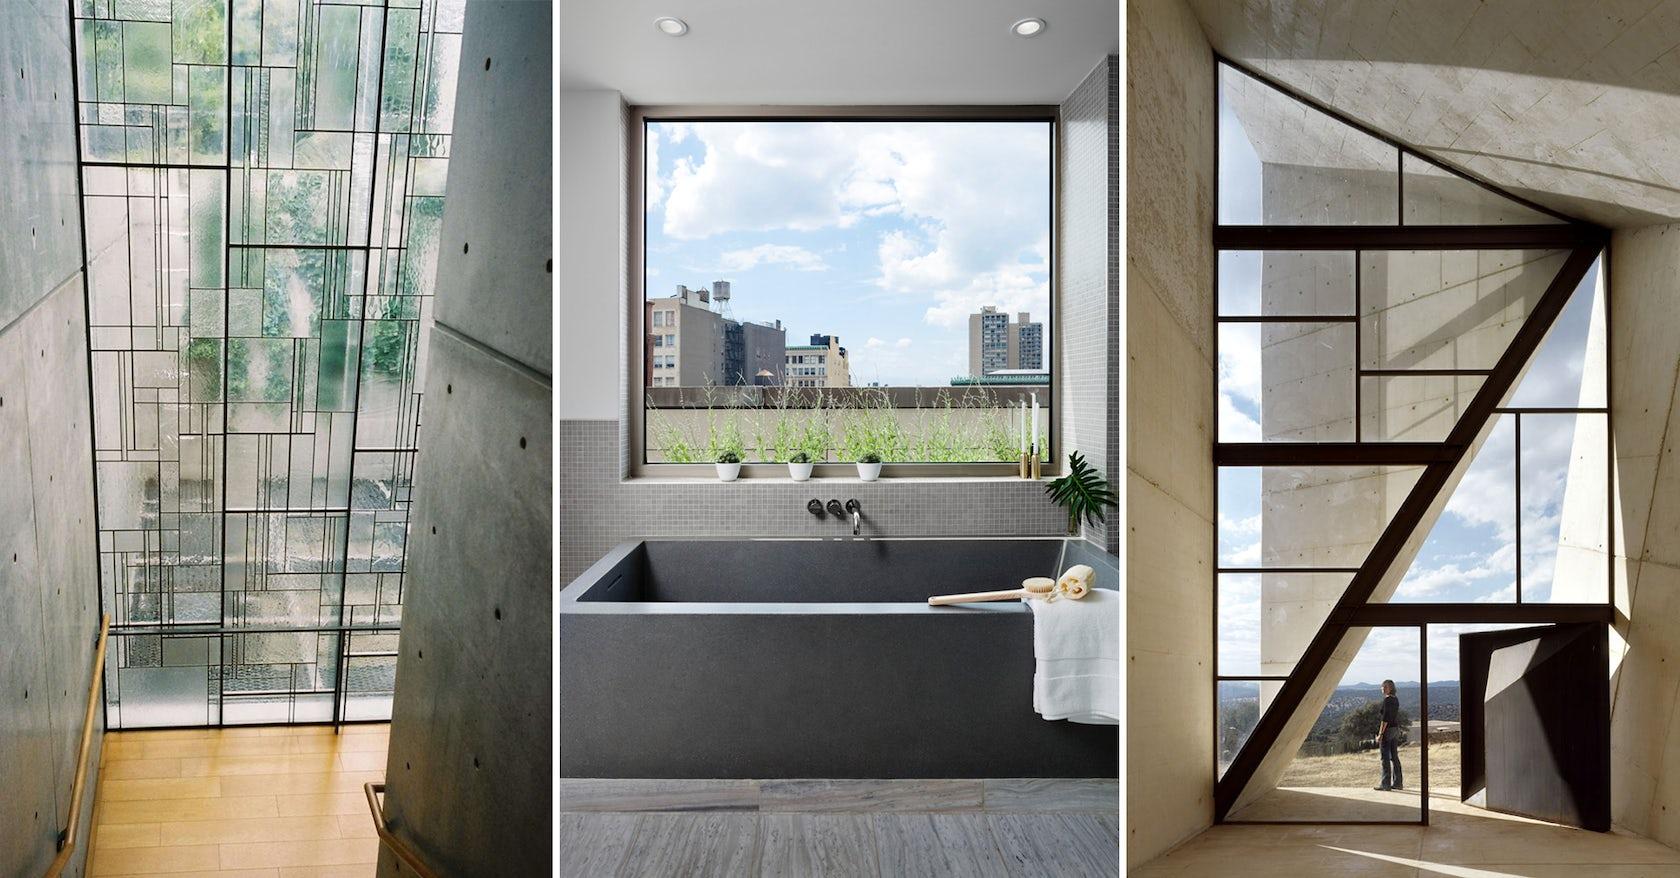 View topic bathroom windows exposed best solution for privacy - View Topic Bathroom Windows Exposed Best Solution For Privacy 11